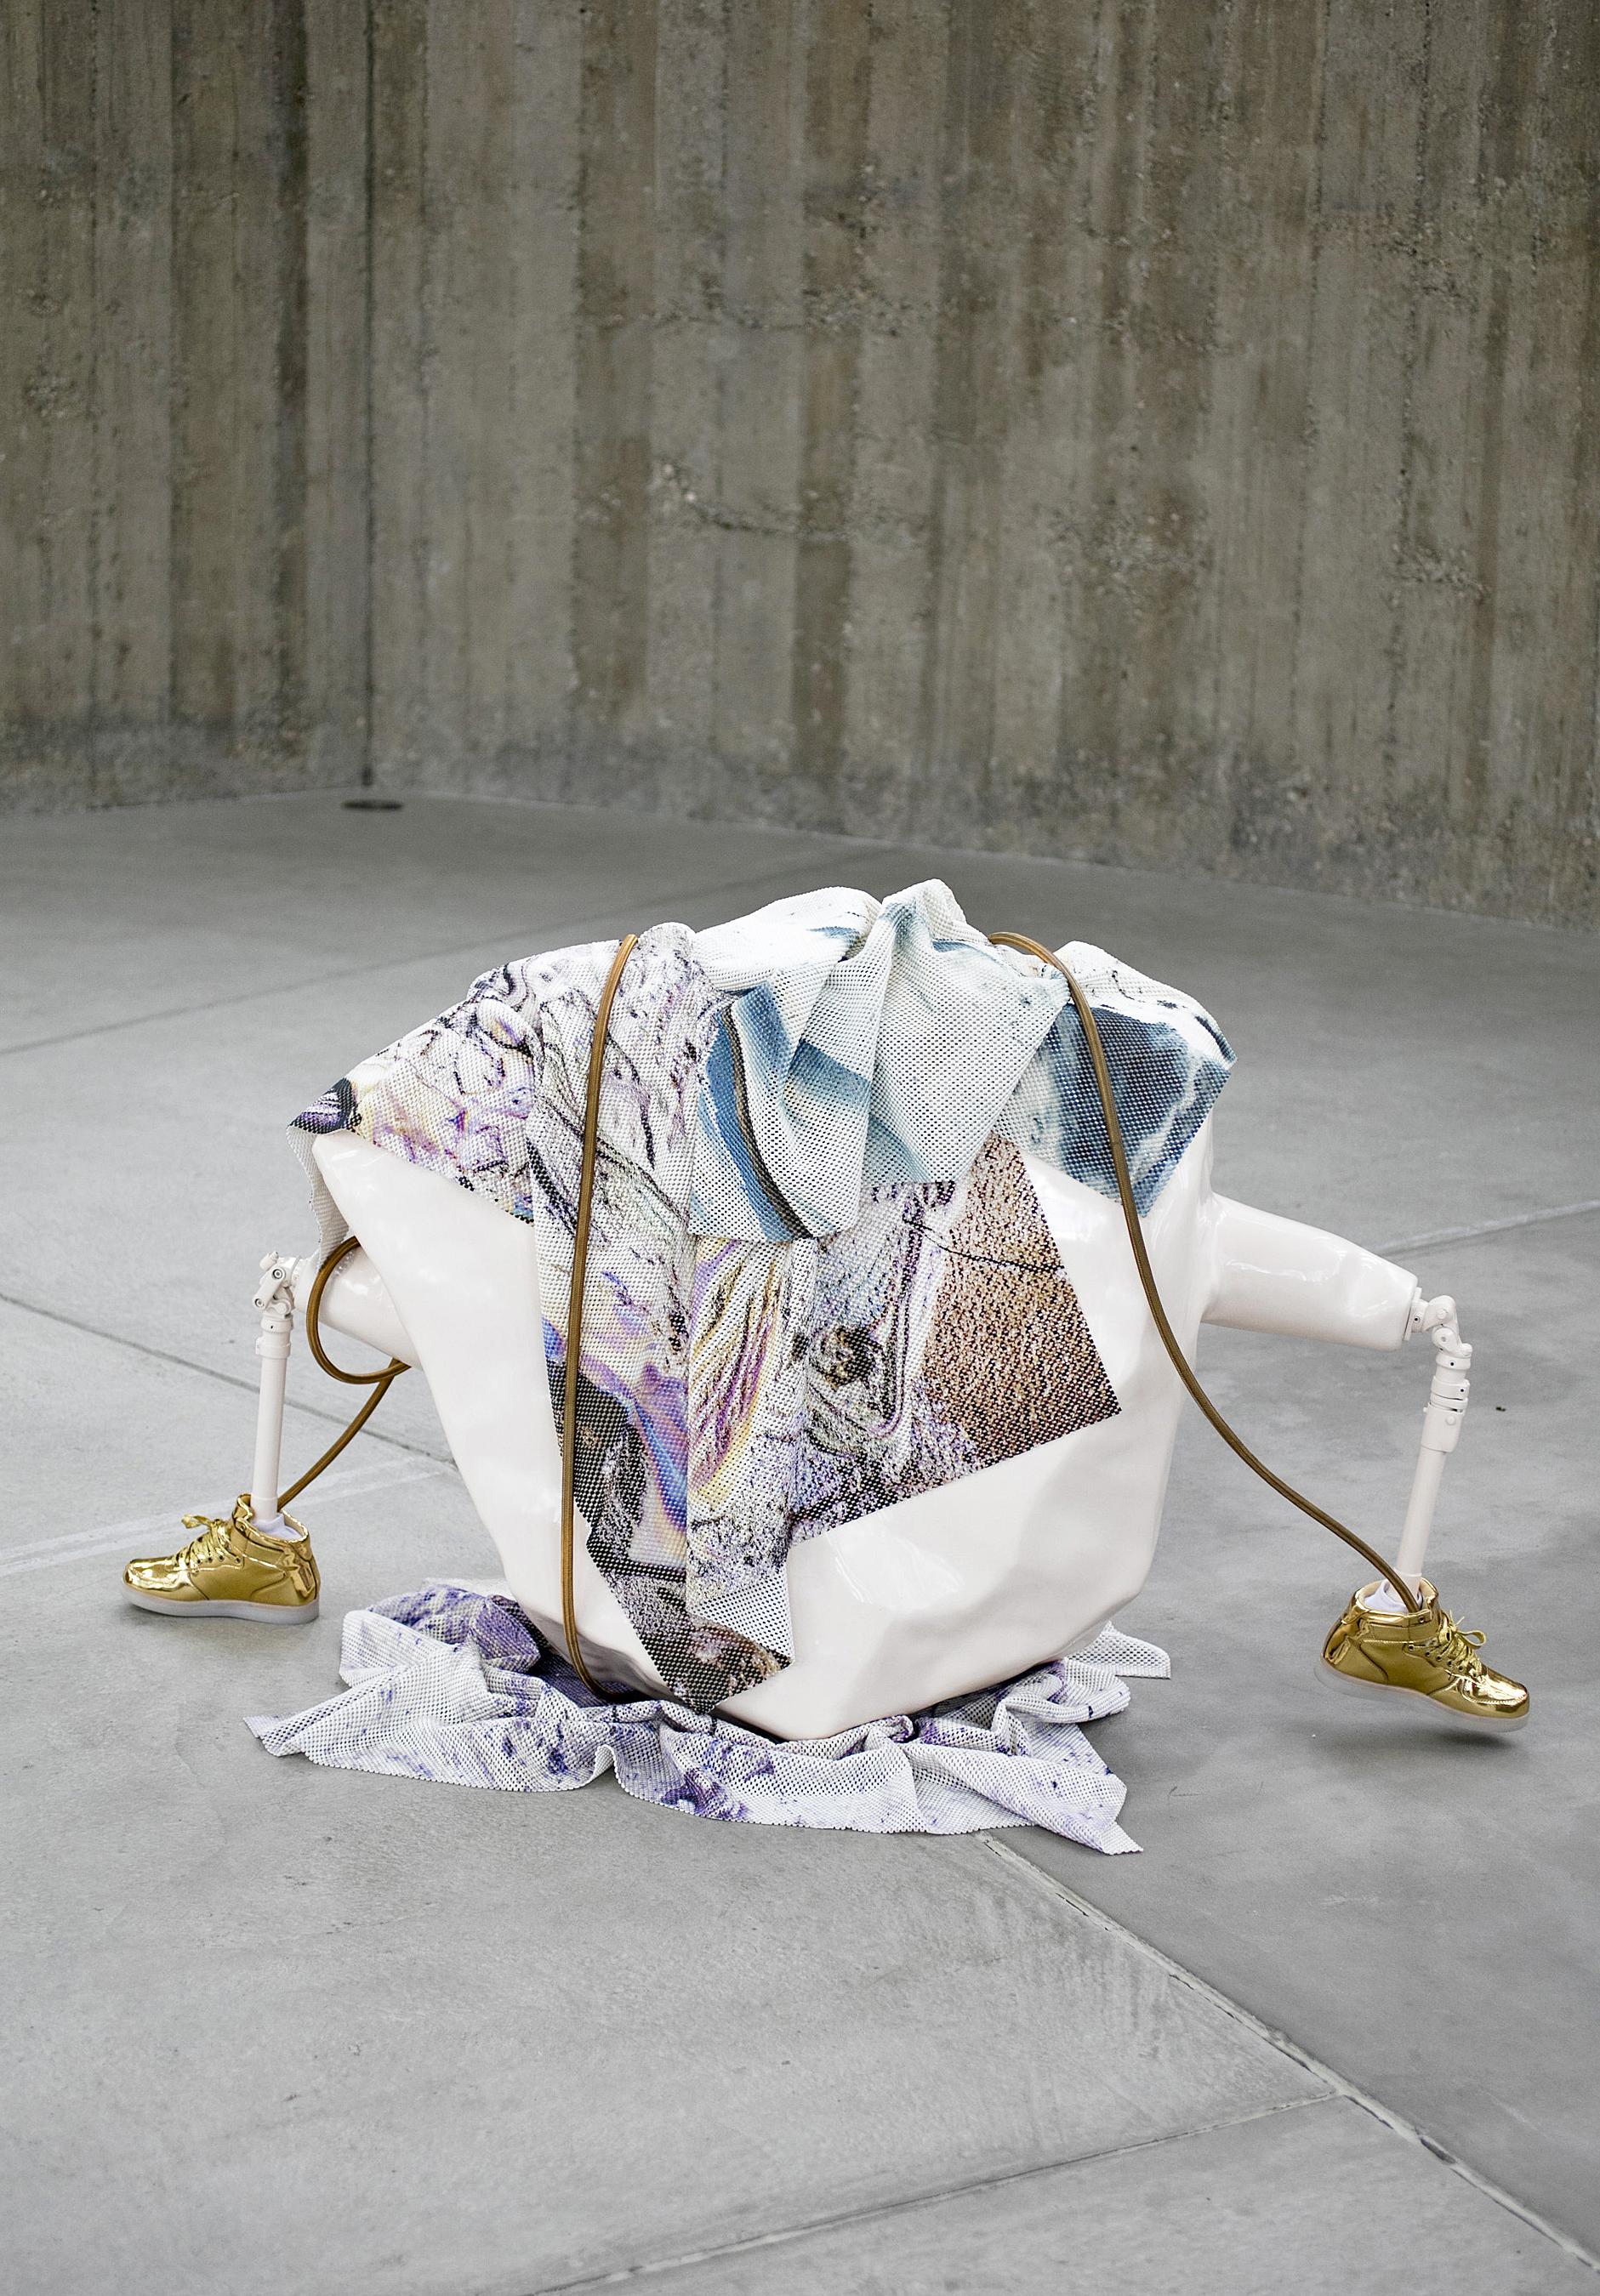 FOLLY, Sculpture, 2017,93 x 160 x 55 cm,Inkjet prints on anti-slip mats (rubber), fiberglass, paint, metal, led-shoes, gas-cable